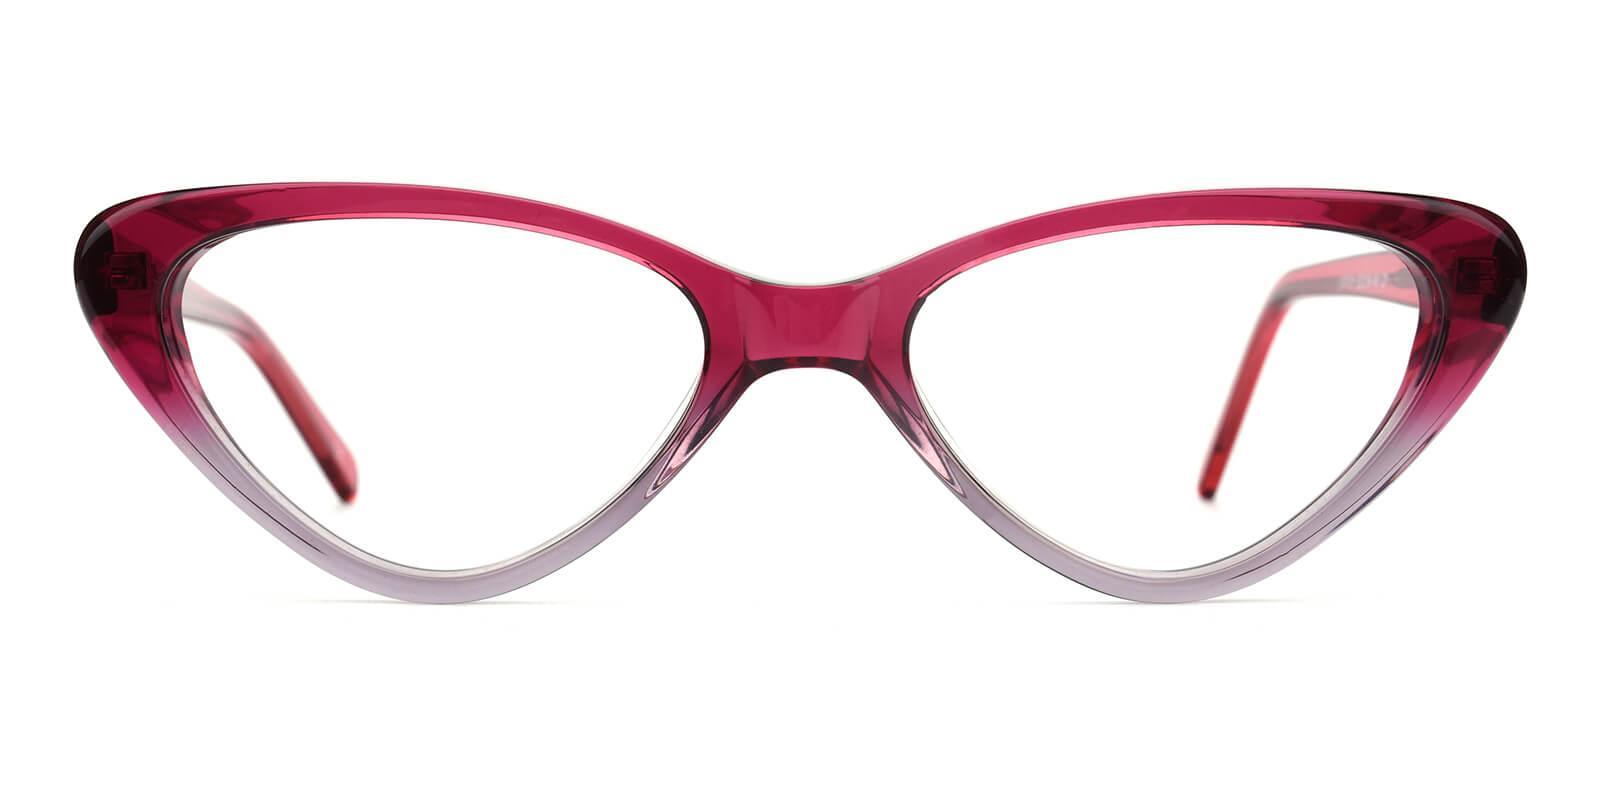 Catalin-Purple-Cat-Acetate-Eyeglasses-additional2